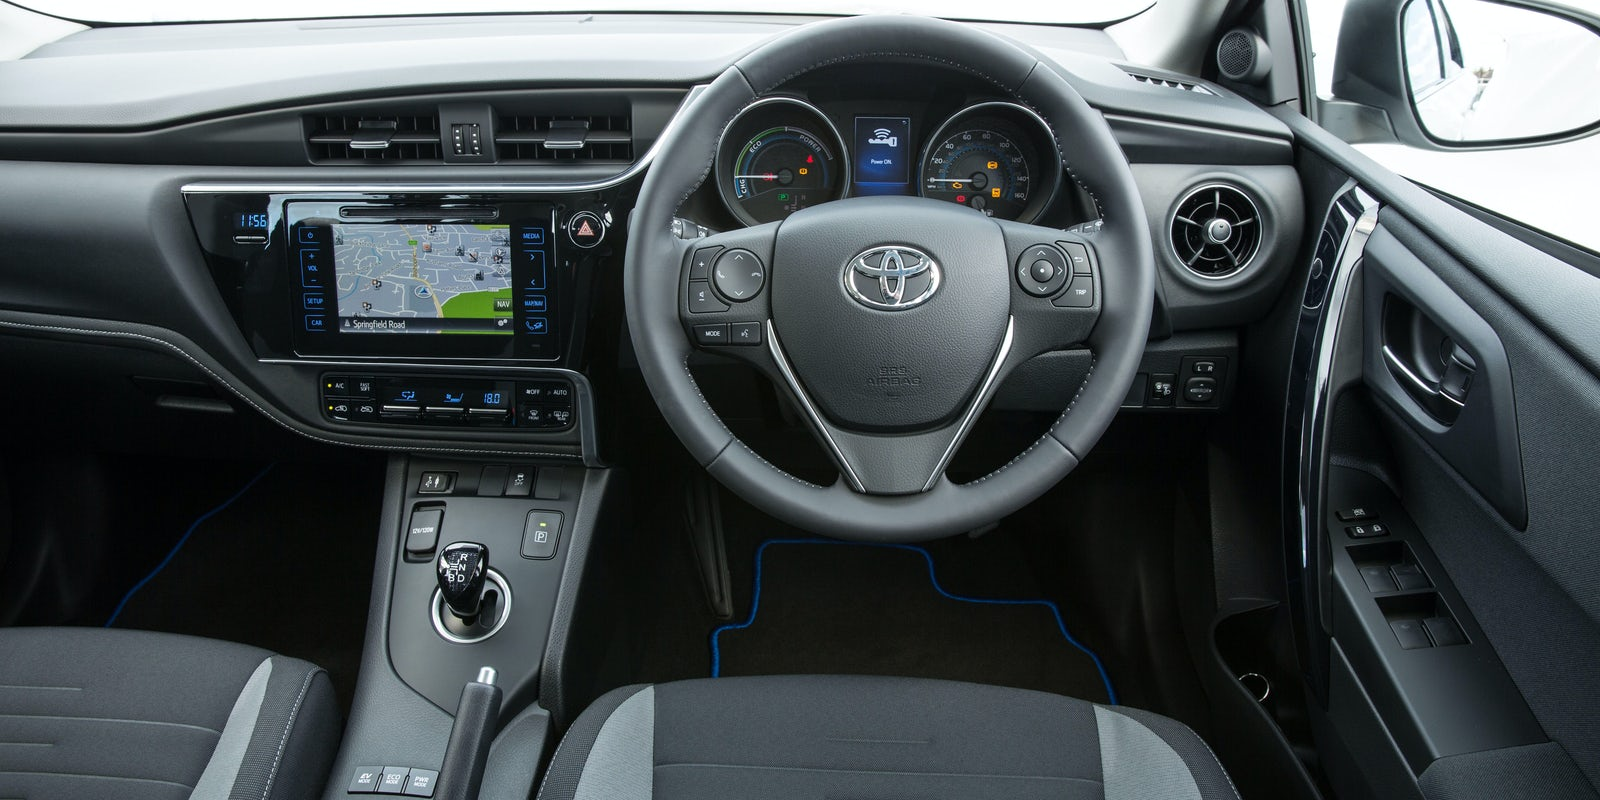 Toyota Auris Interior & Infotainment | carwow